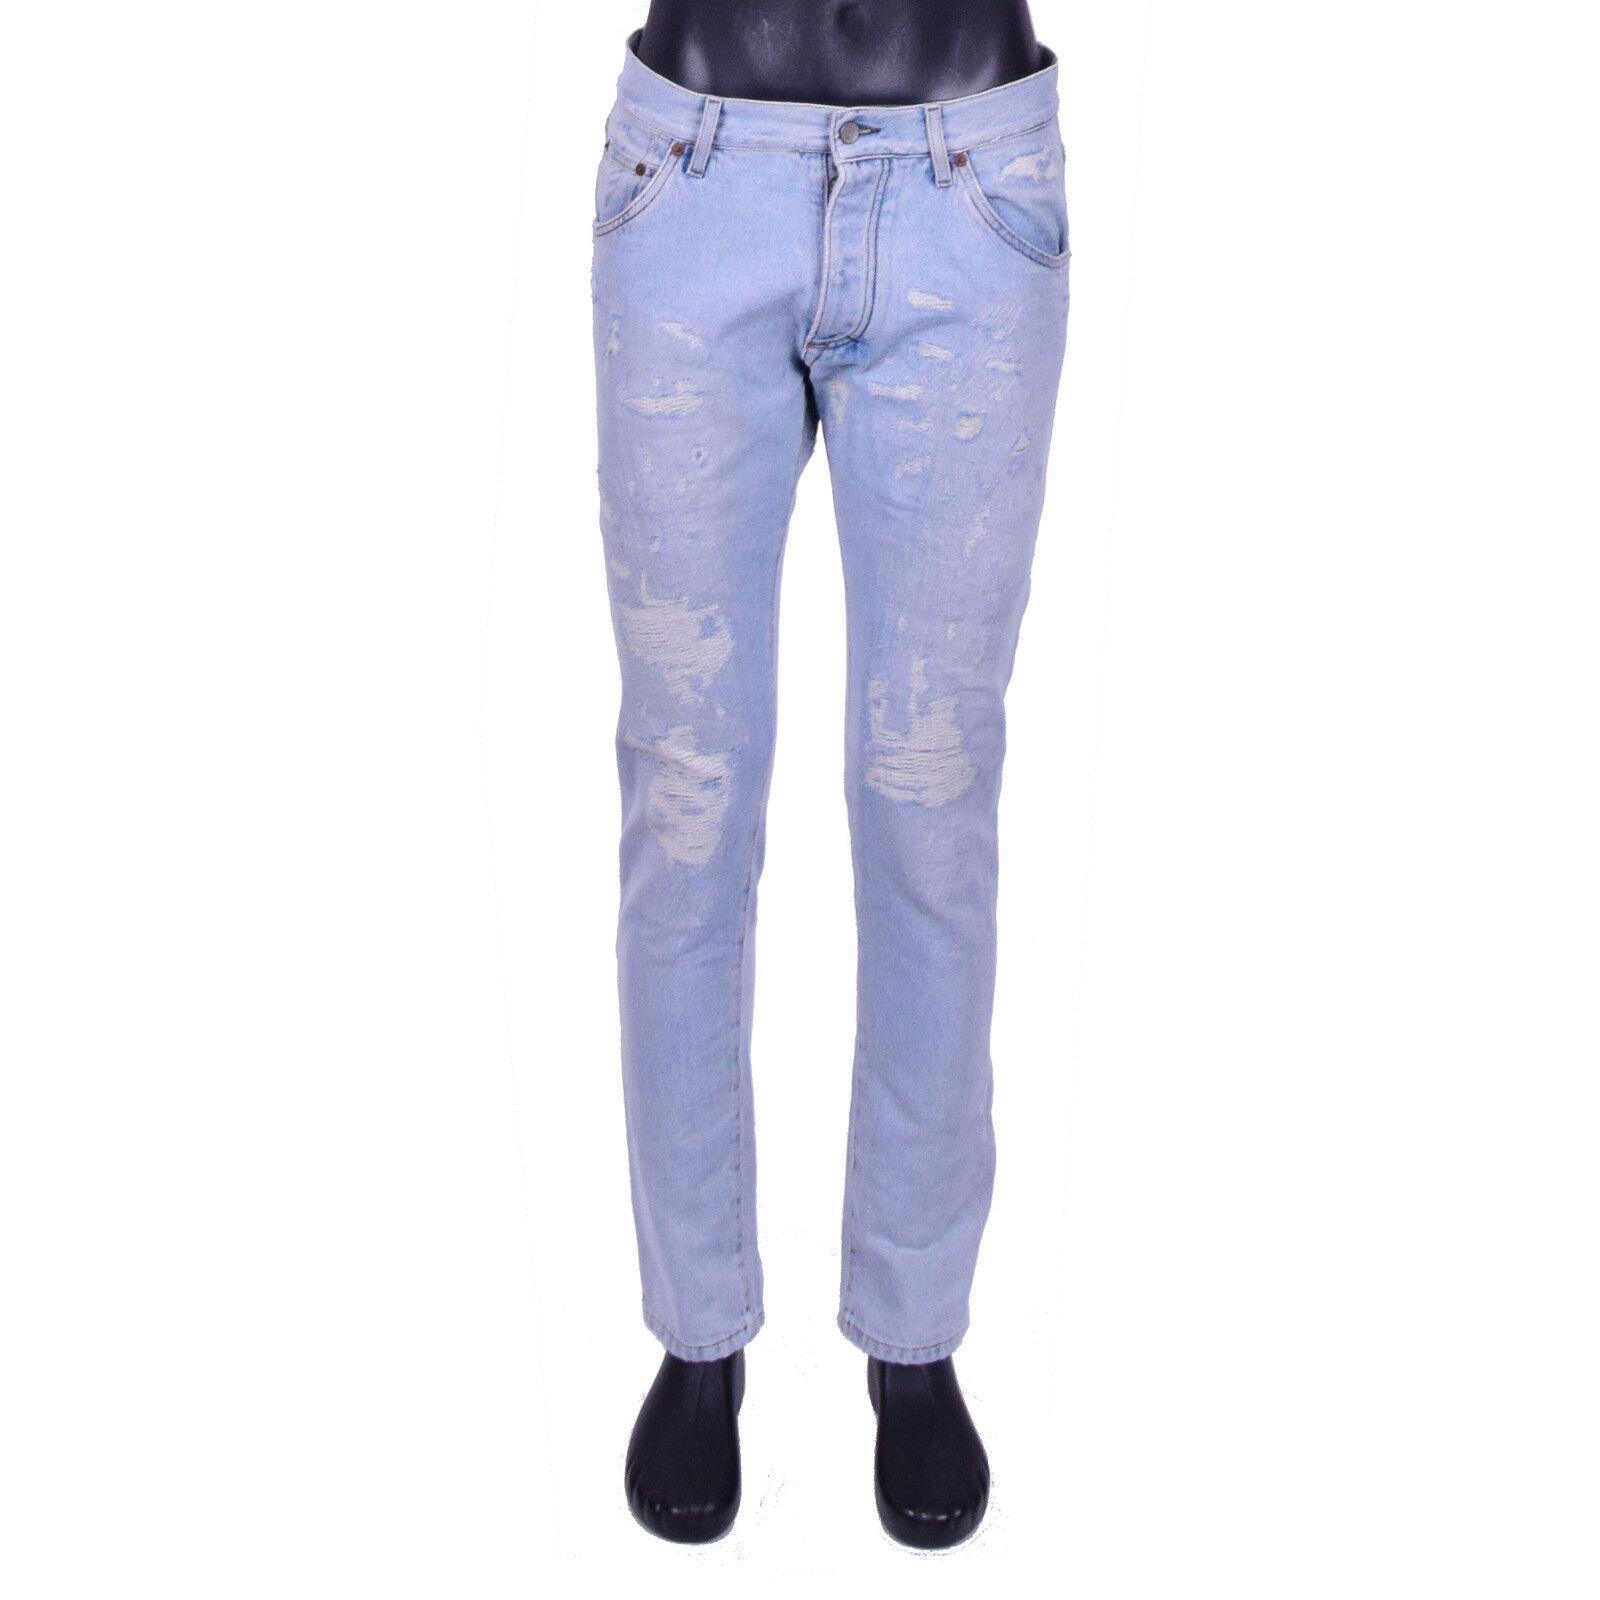 DOLCE & GABBANA Jeans aus Denim Hellblau im Destroyed Look Modell Capri IT 46 S